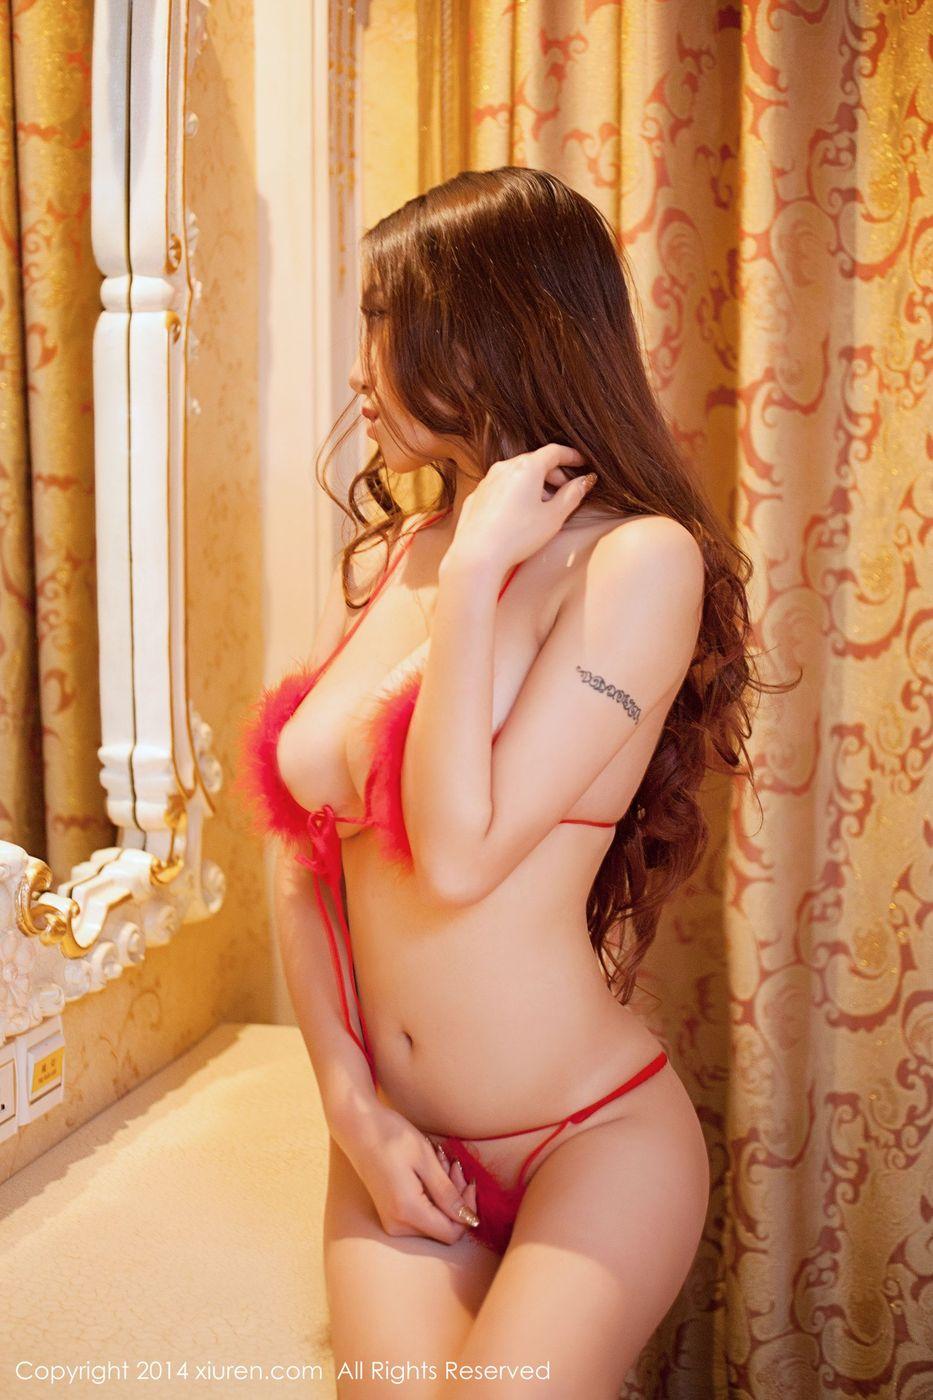 [XIUREN秀人网] 混血美女模特陈思琪Art极品巨乳女神私房照